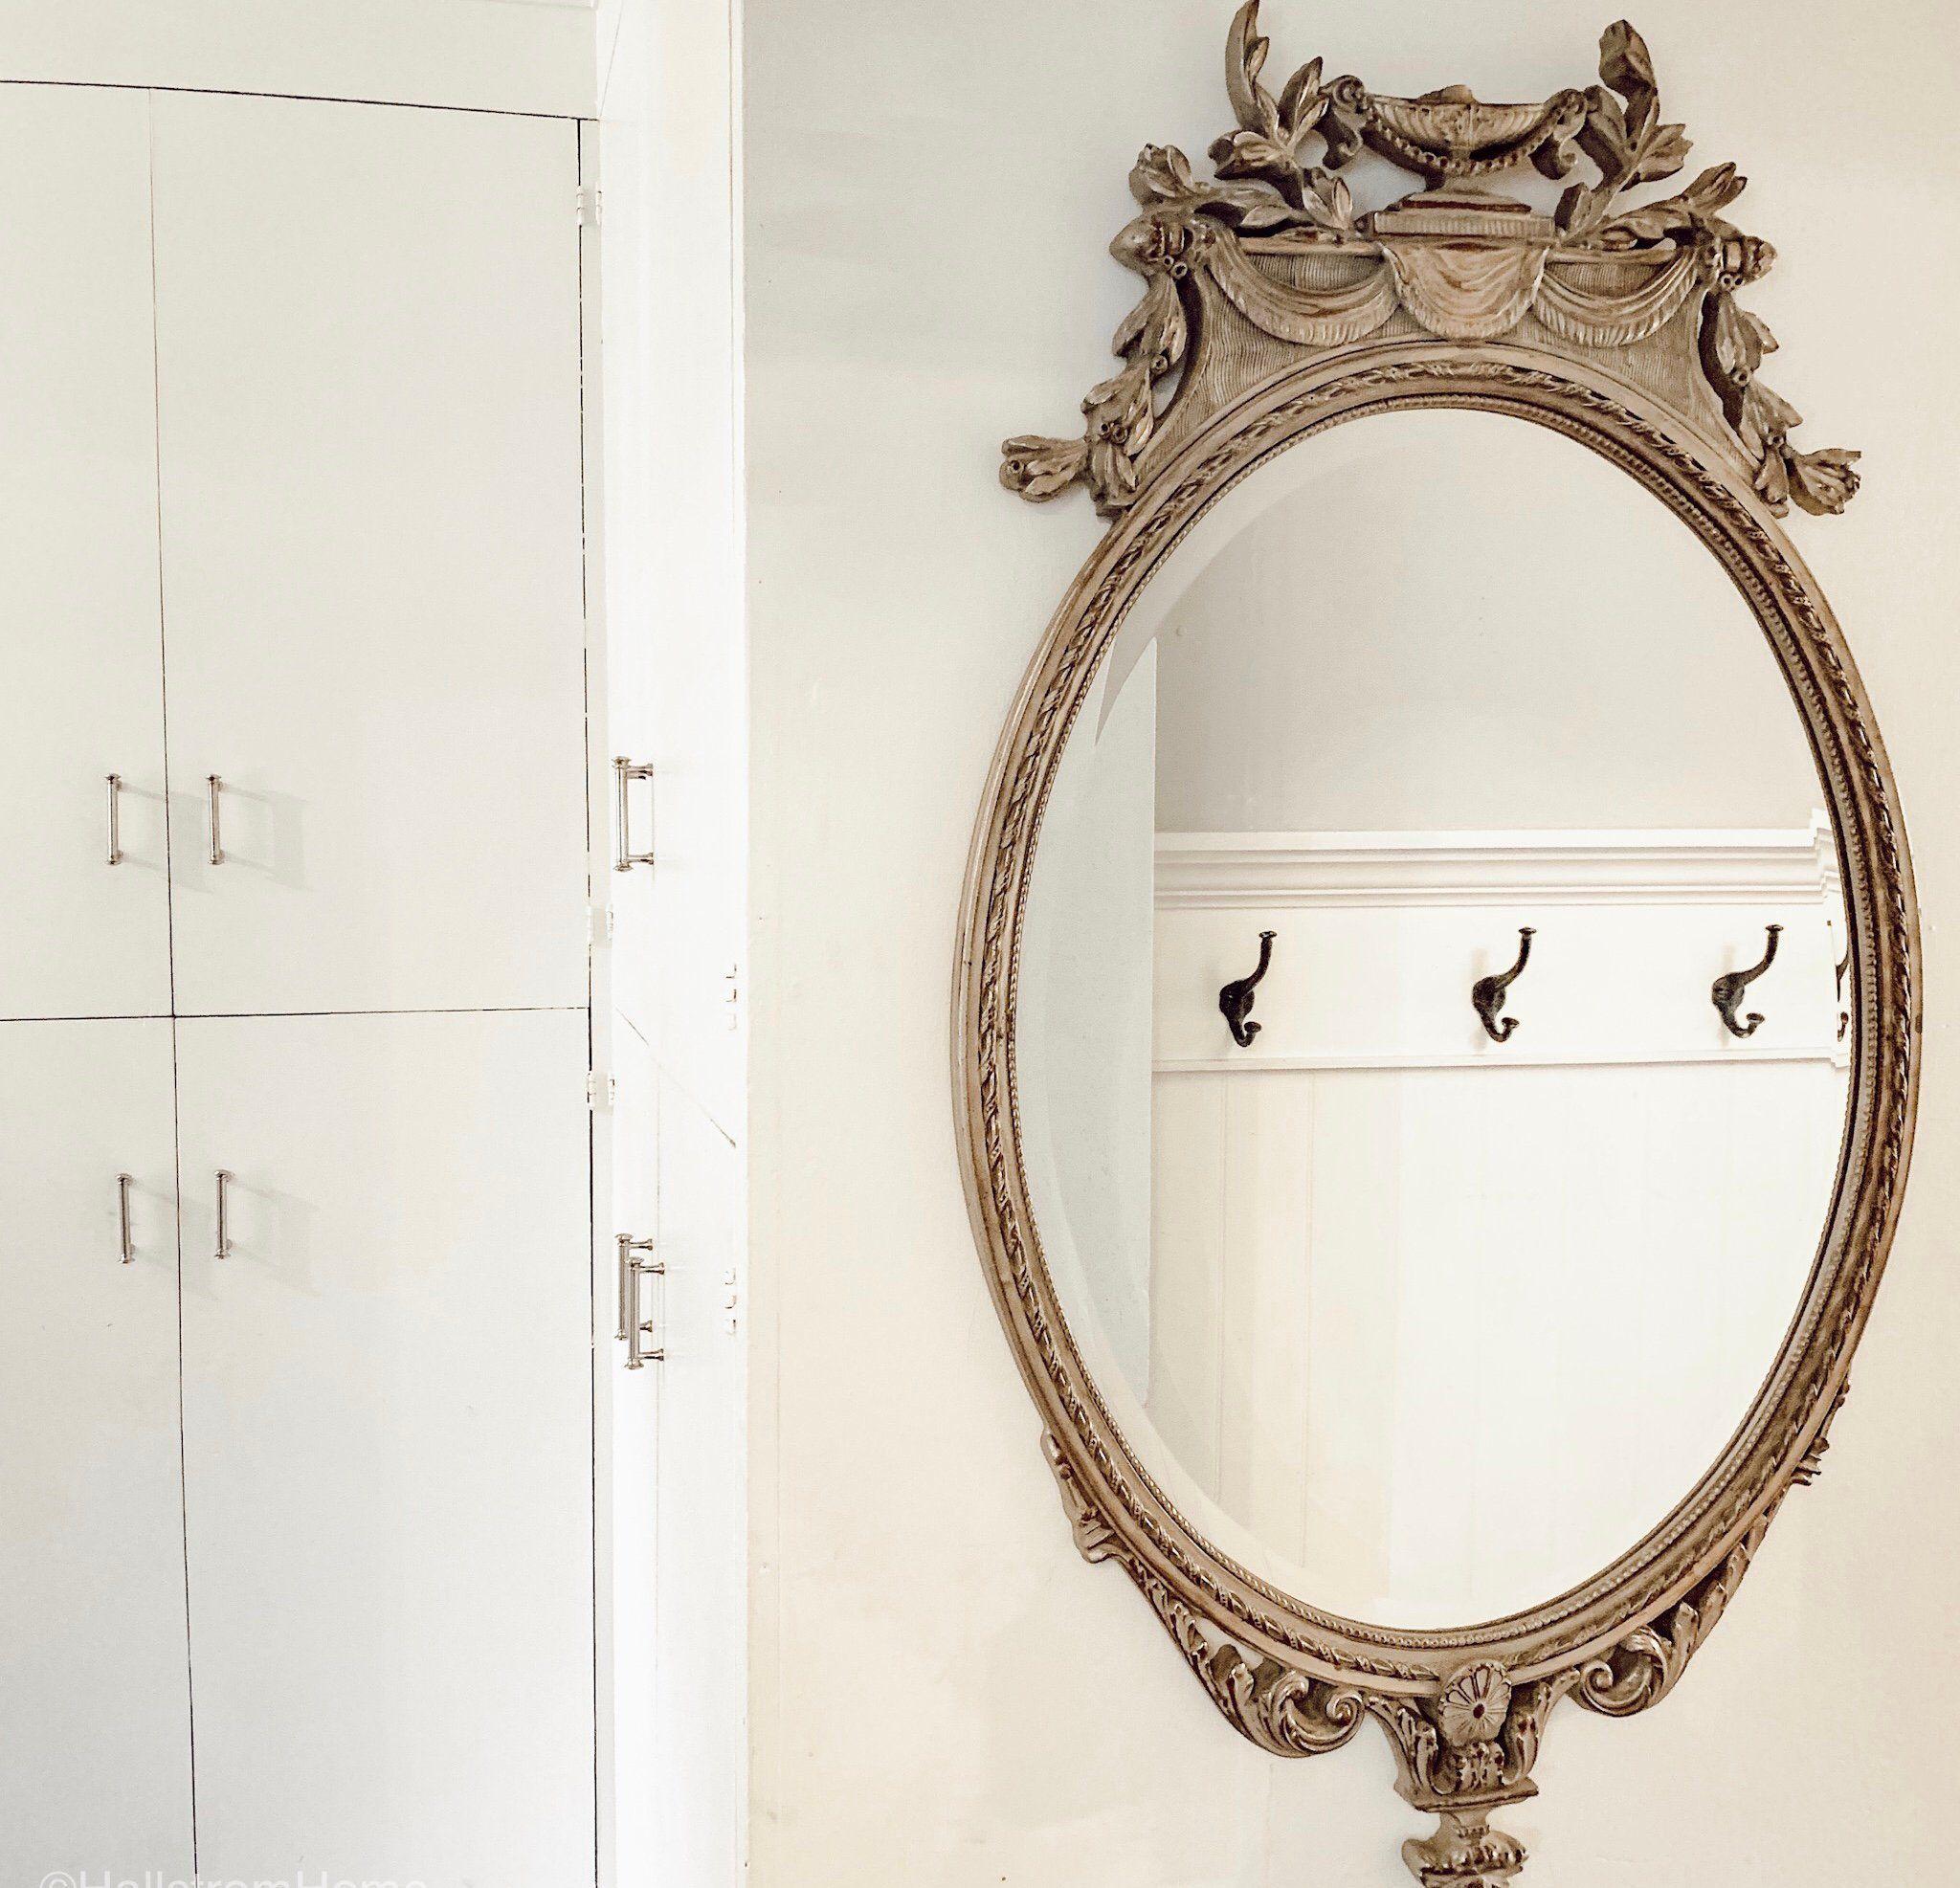 Large Oval Ornate Mirror, Farmhouse Wall Decor, Wall